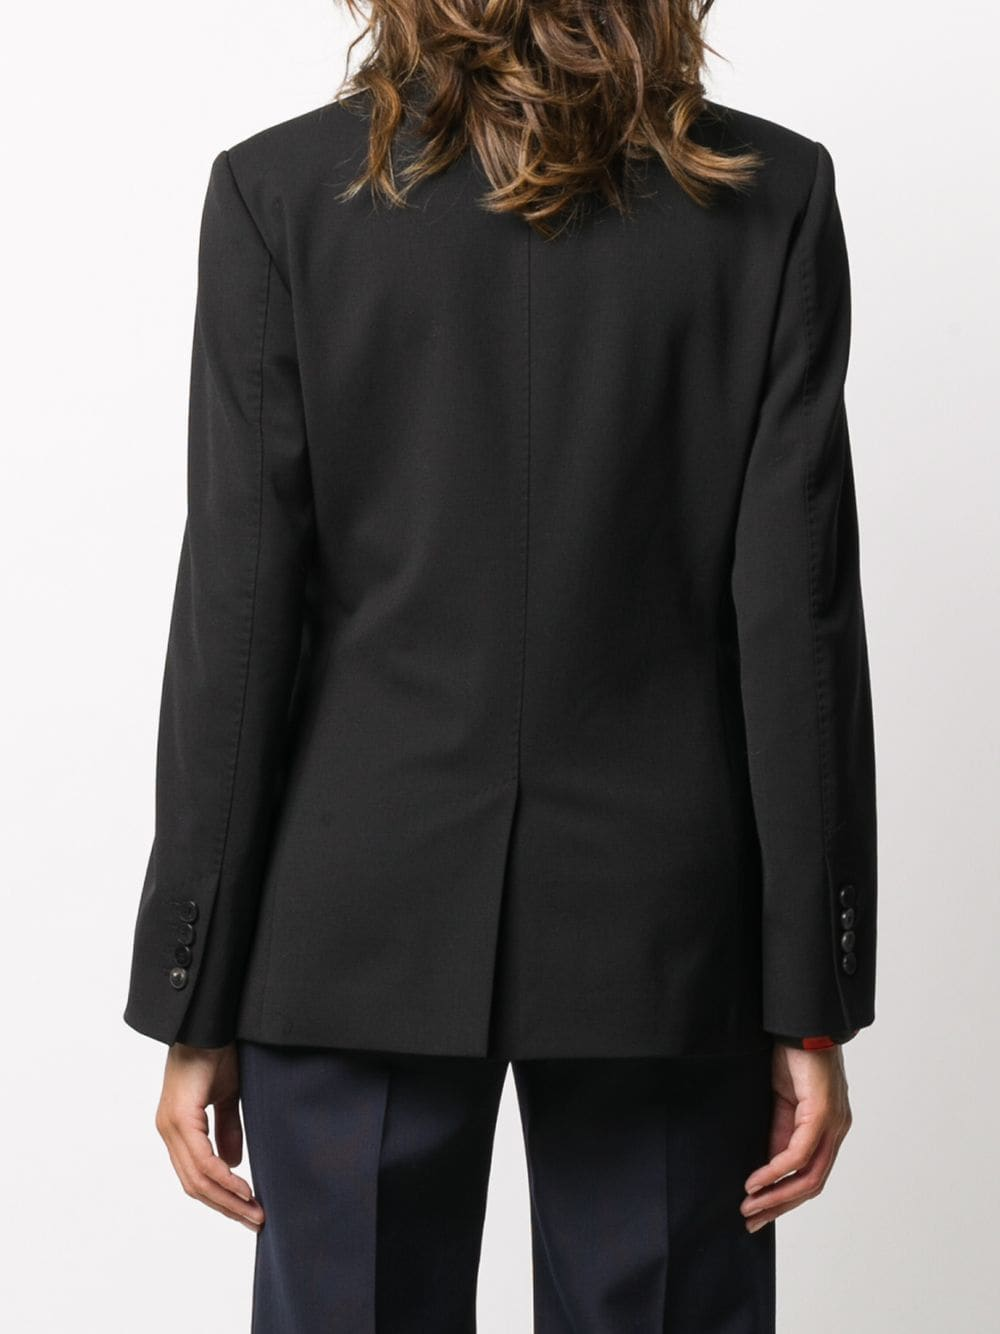 black cotton and virgin wool blazer featuring wide peak lapels ALBERTO BIANI |  | II821-WO024190